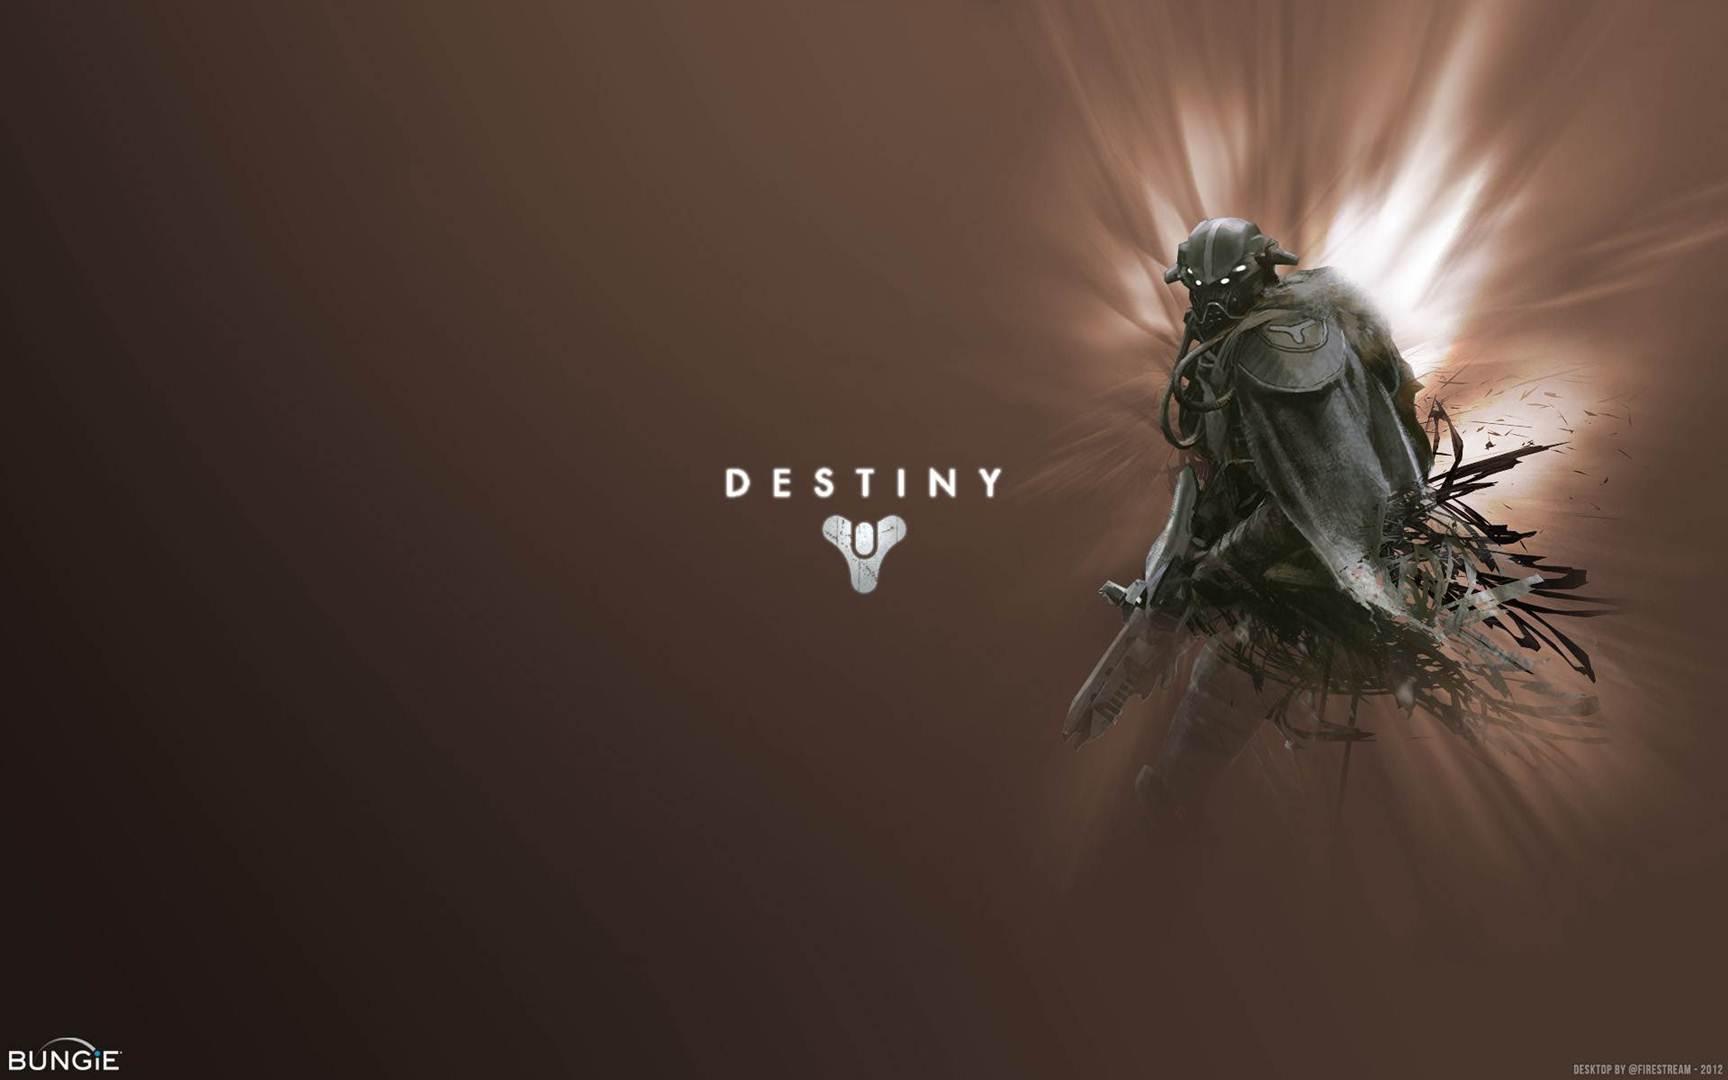 bungies destiny wallpapers in 1080p hdbungie destiny wallpaper in hd 1728x1080